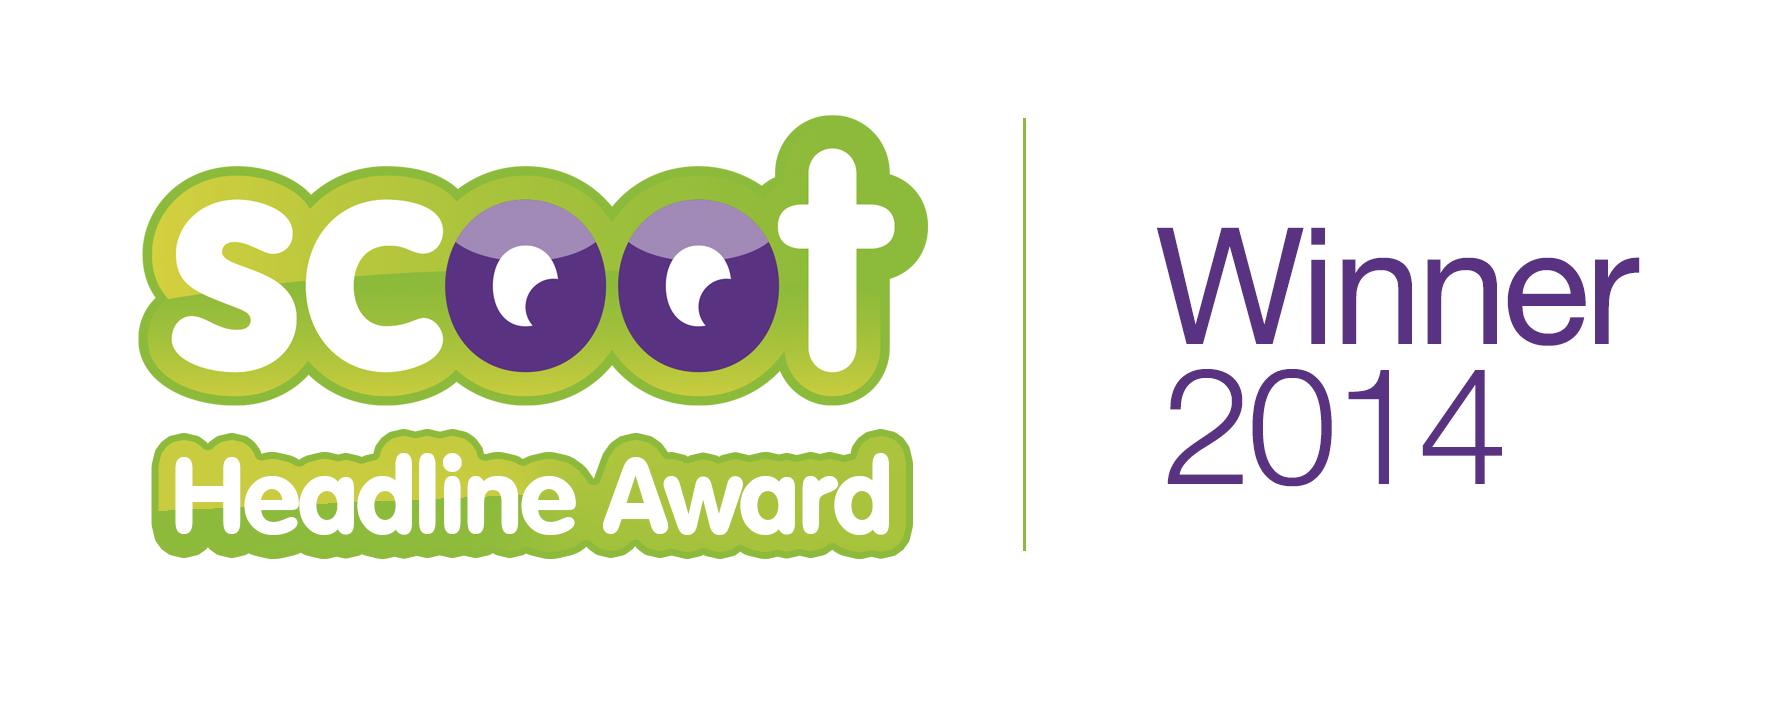 Scoot Headline Award Winner 2014